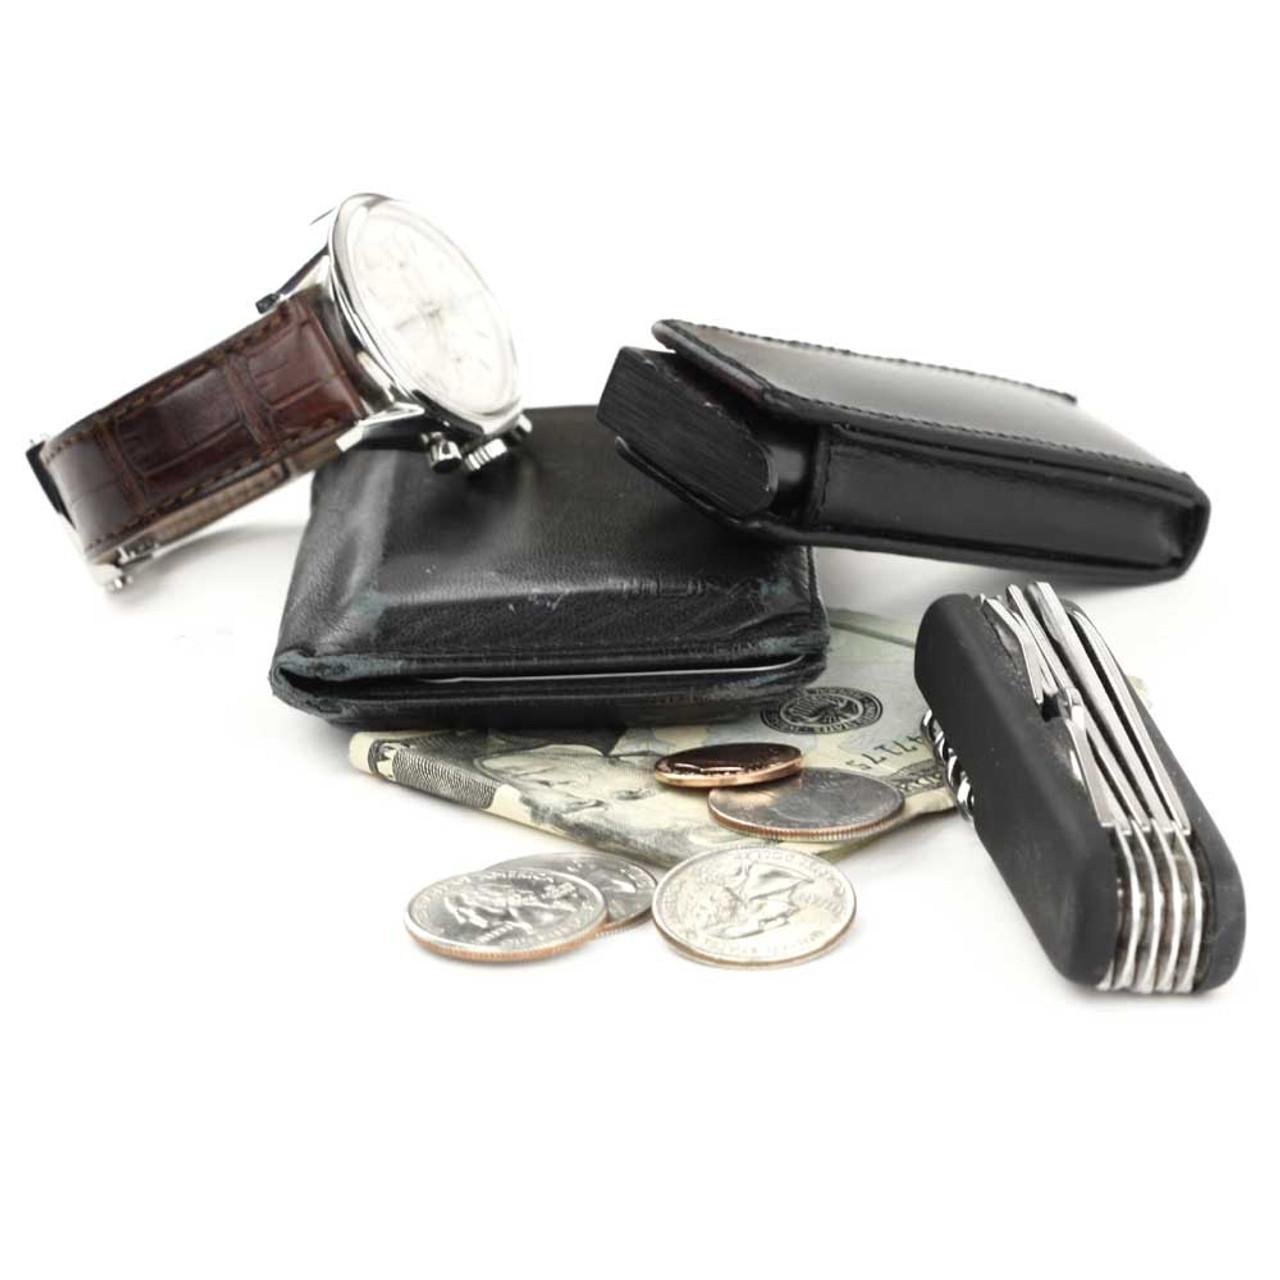 Glock 43 Magazine Pocket Protector